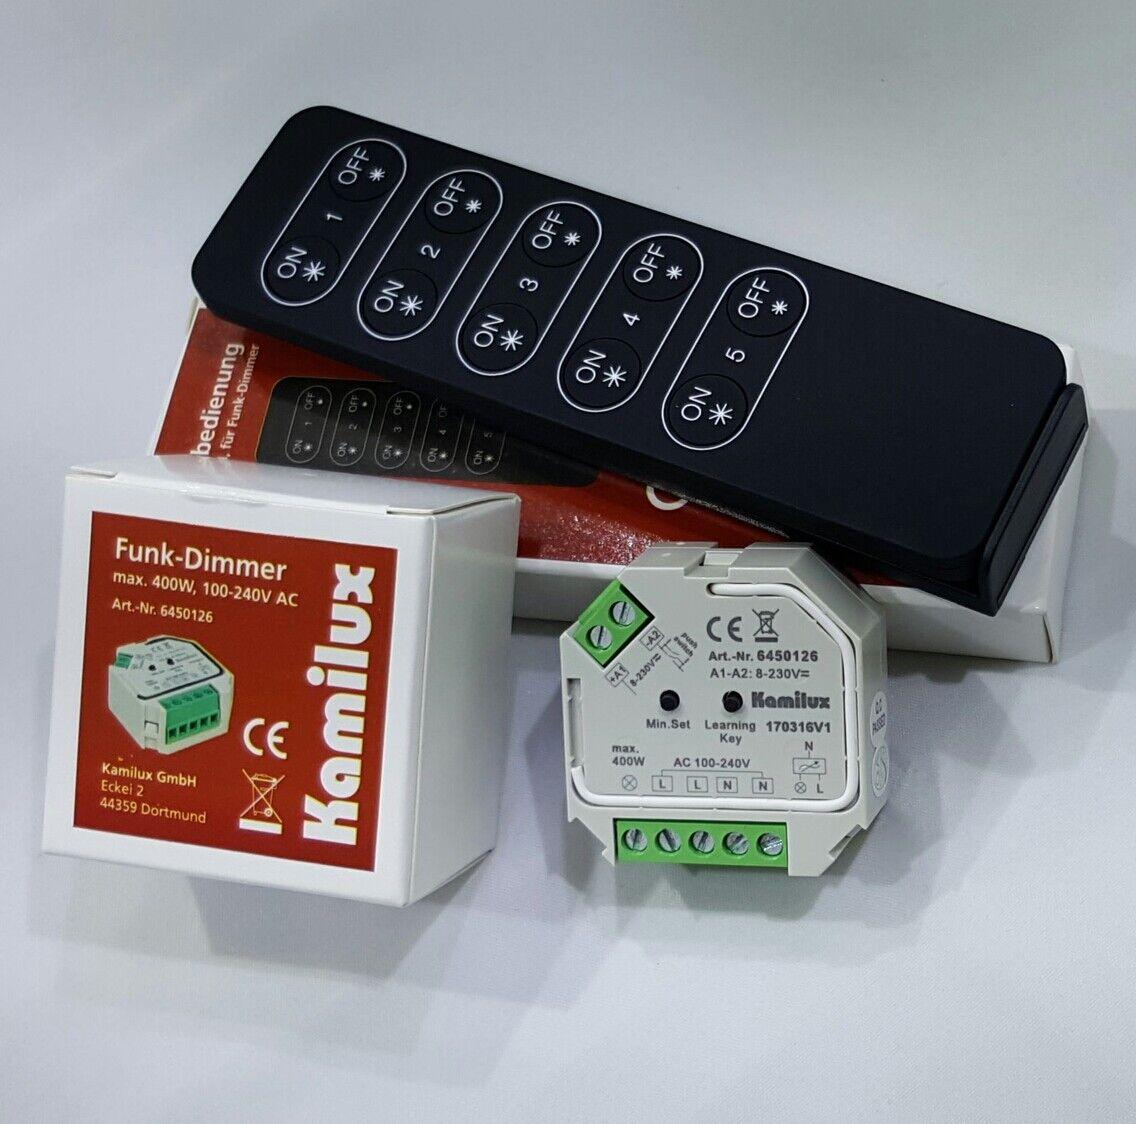 Tast Dimmer Elmo 230V-LED max. 400 Watt Dimm funkfernbedinung inkl. Knopfzelle